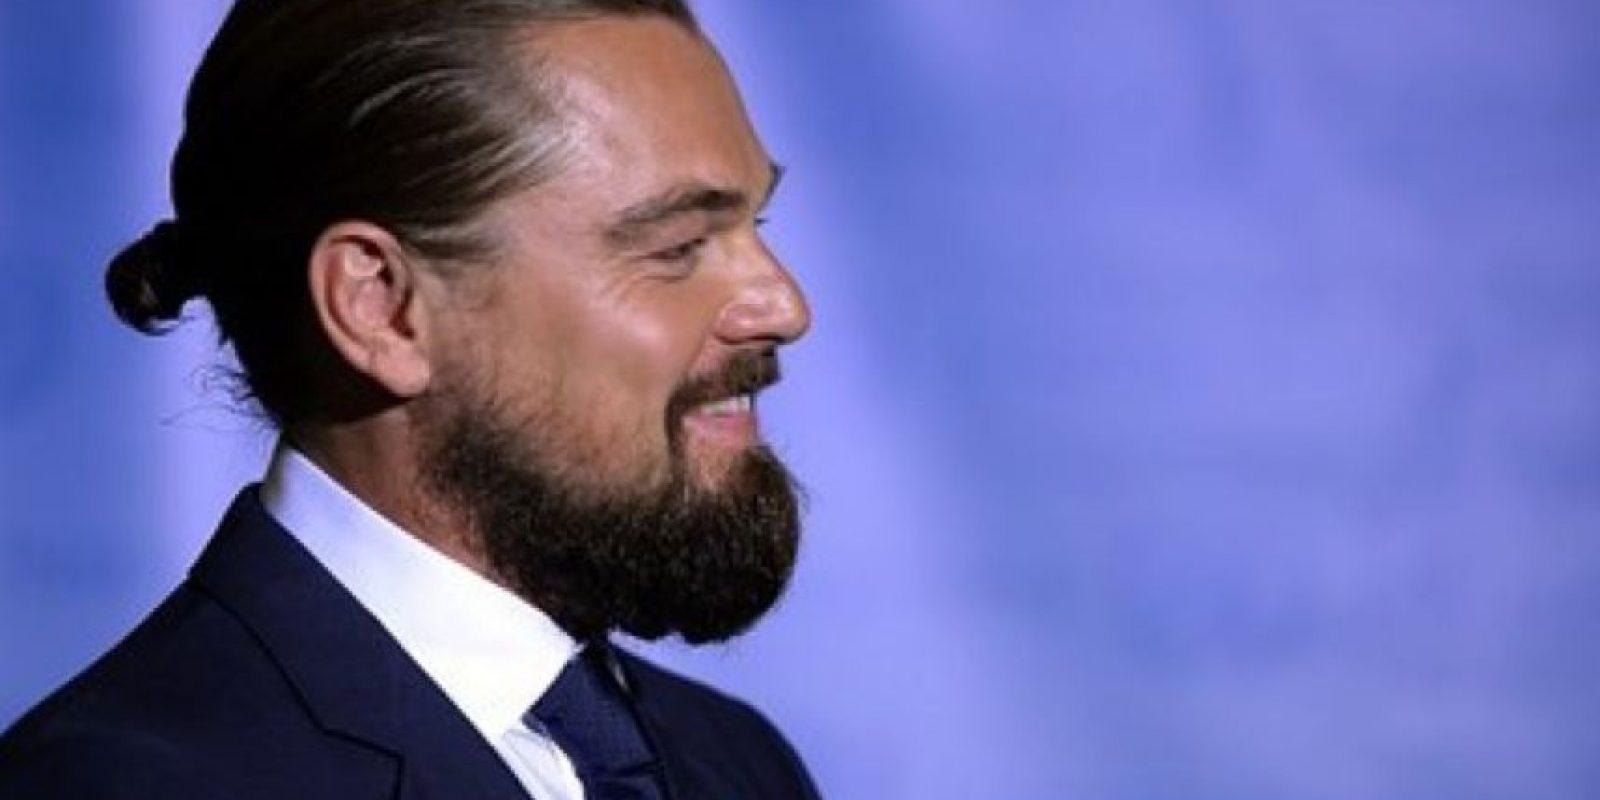 Así se le ve con moña. Foto:Getty Images